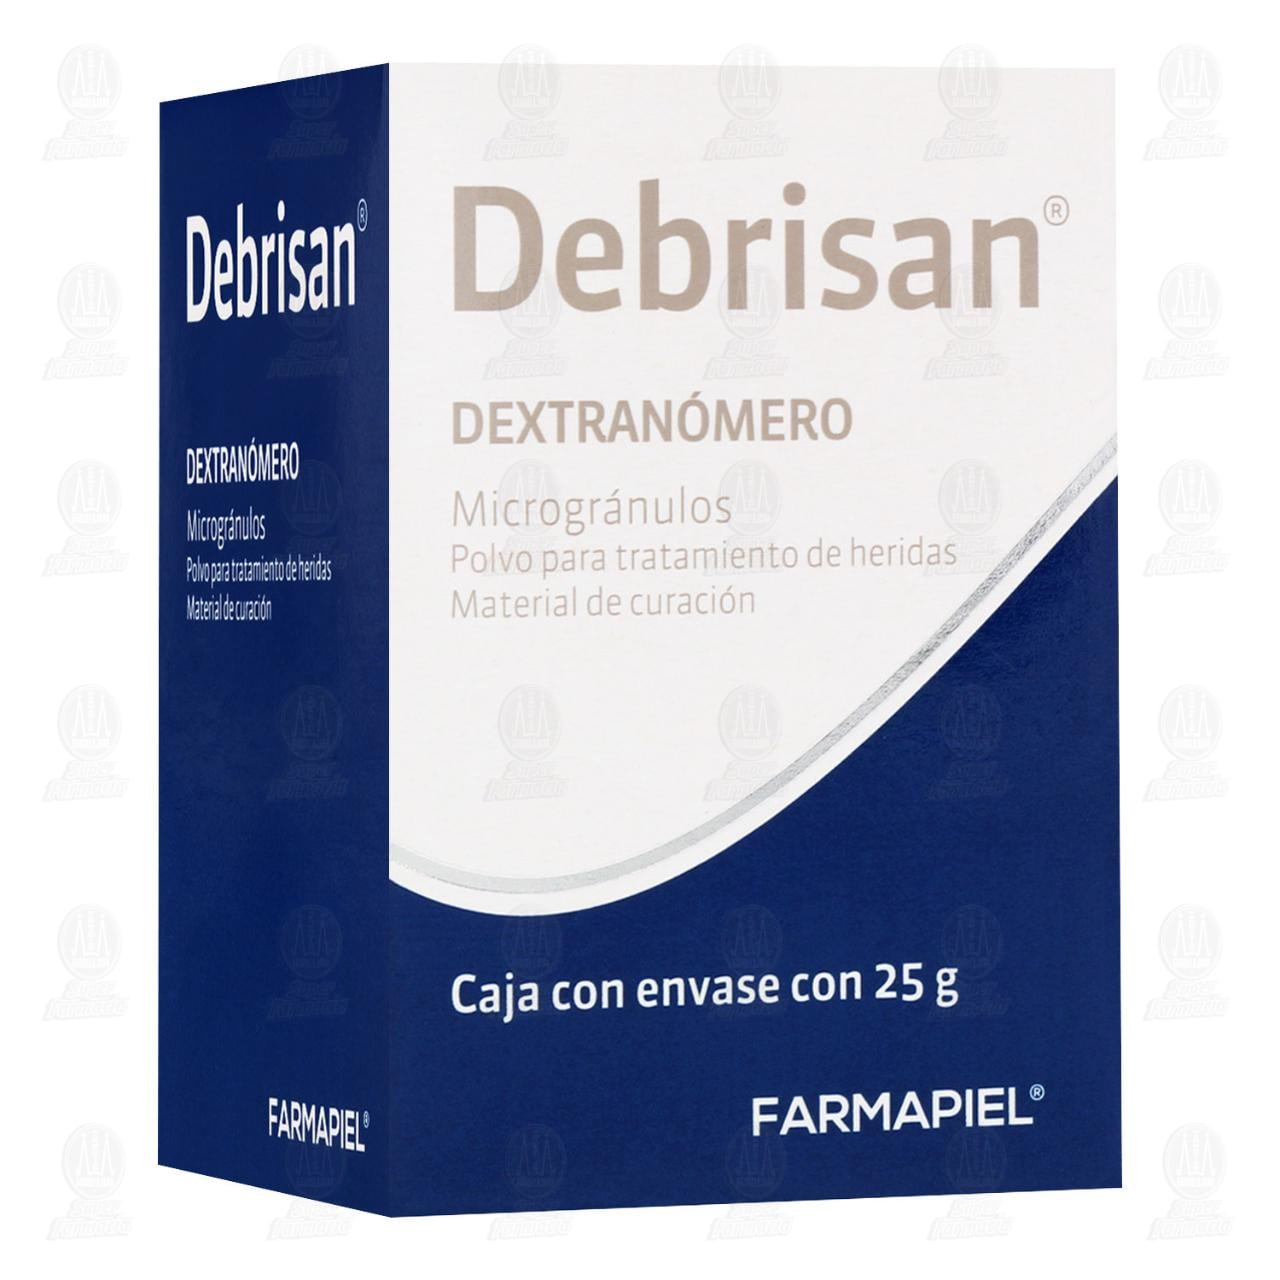 Debrisan Dextranómero Microgránulos 25gr Frasco